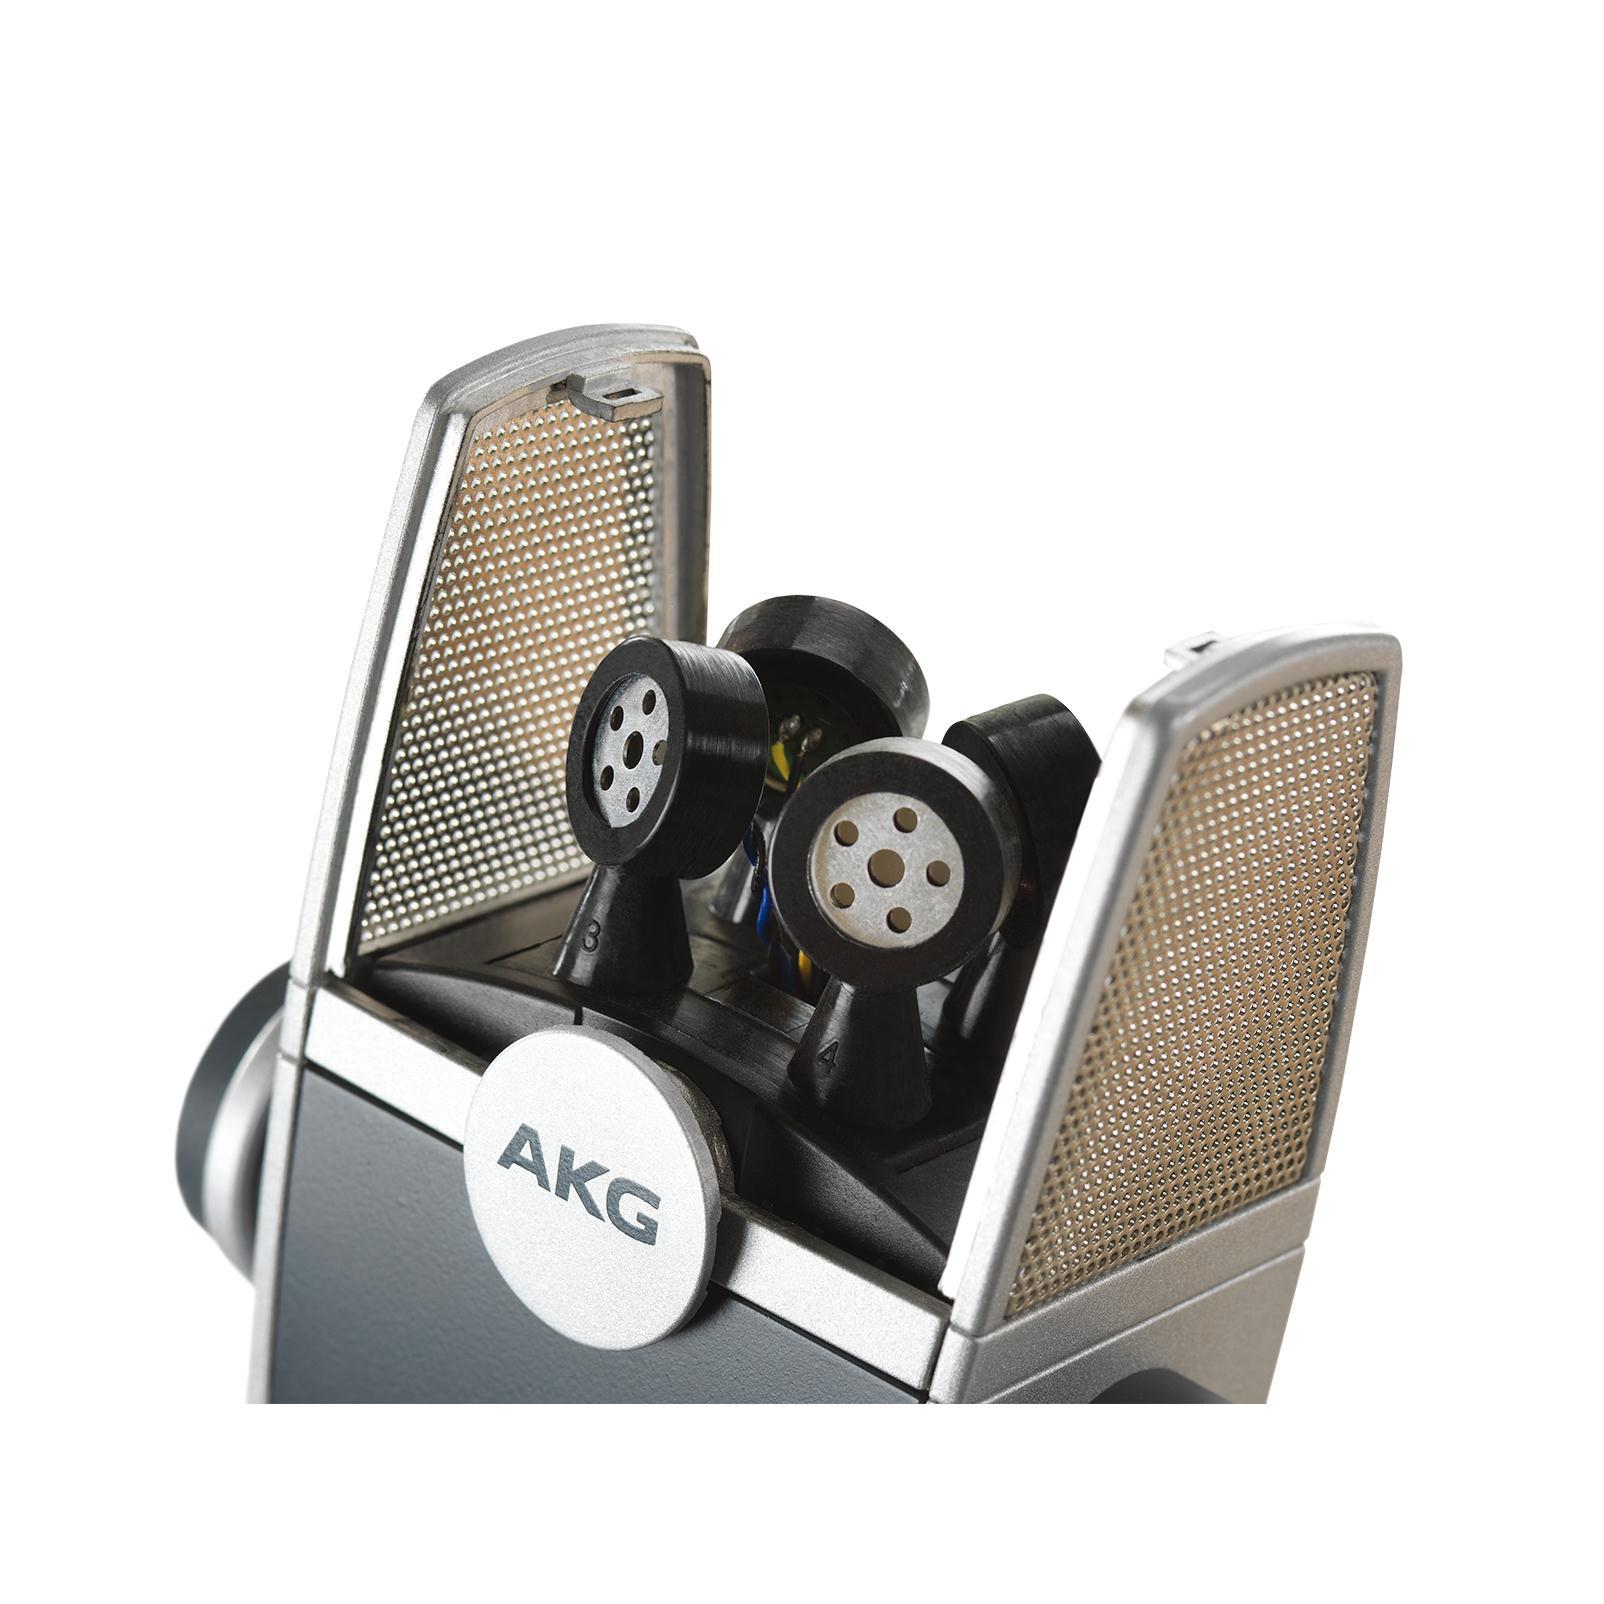 AKG Microfone Condensador LYRA C44 USB